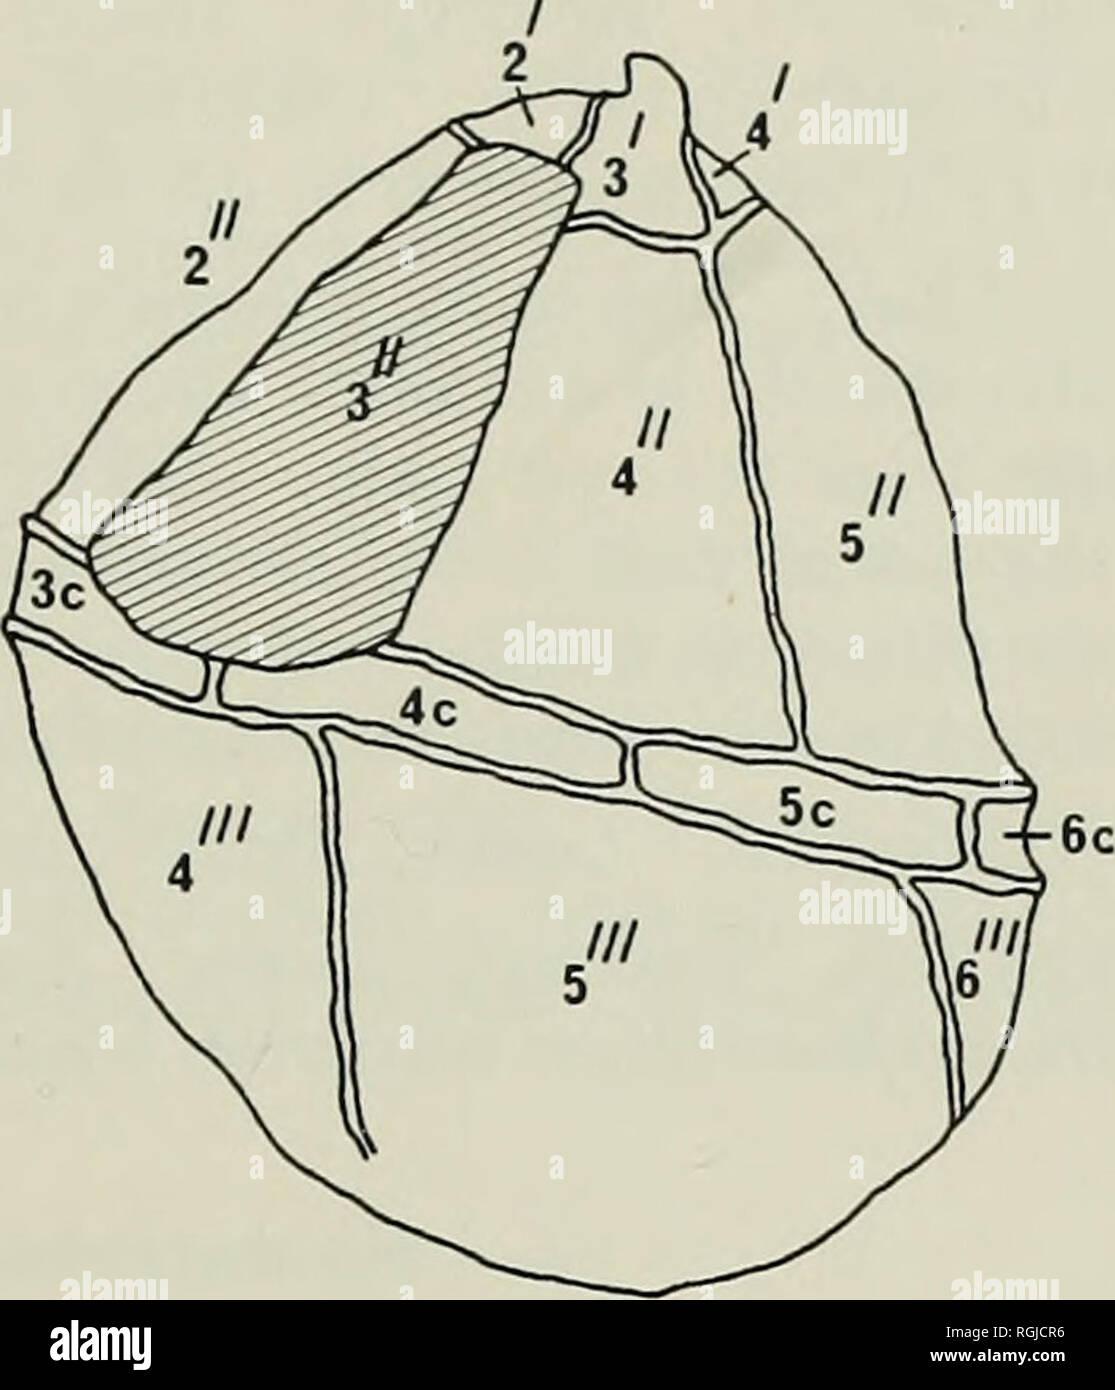 hight resolution of  bulletin of the british museum natural history geology a b fig 14 gonyaulacysta tenuitabulata gerlach de coninck